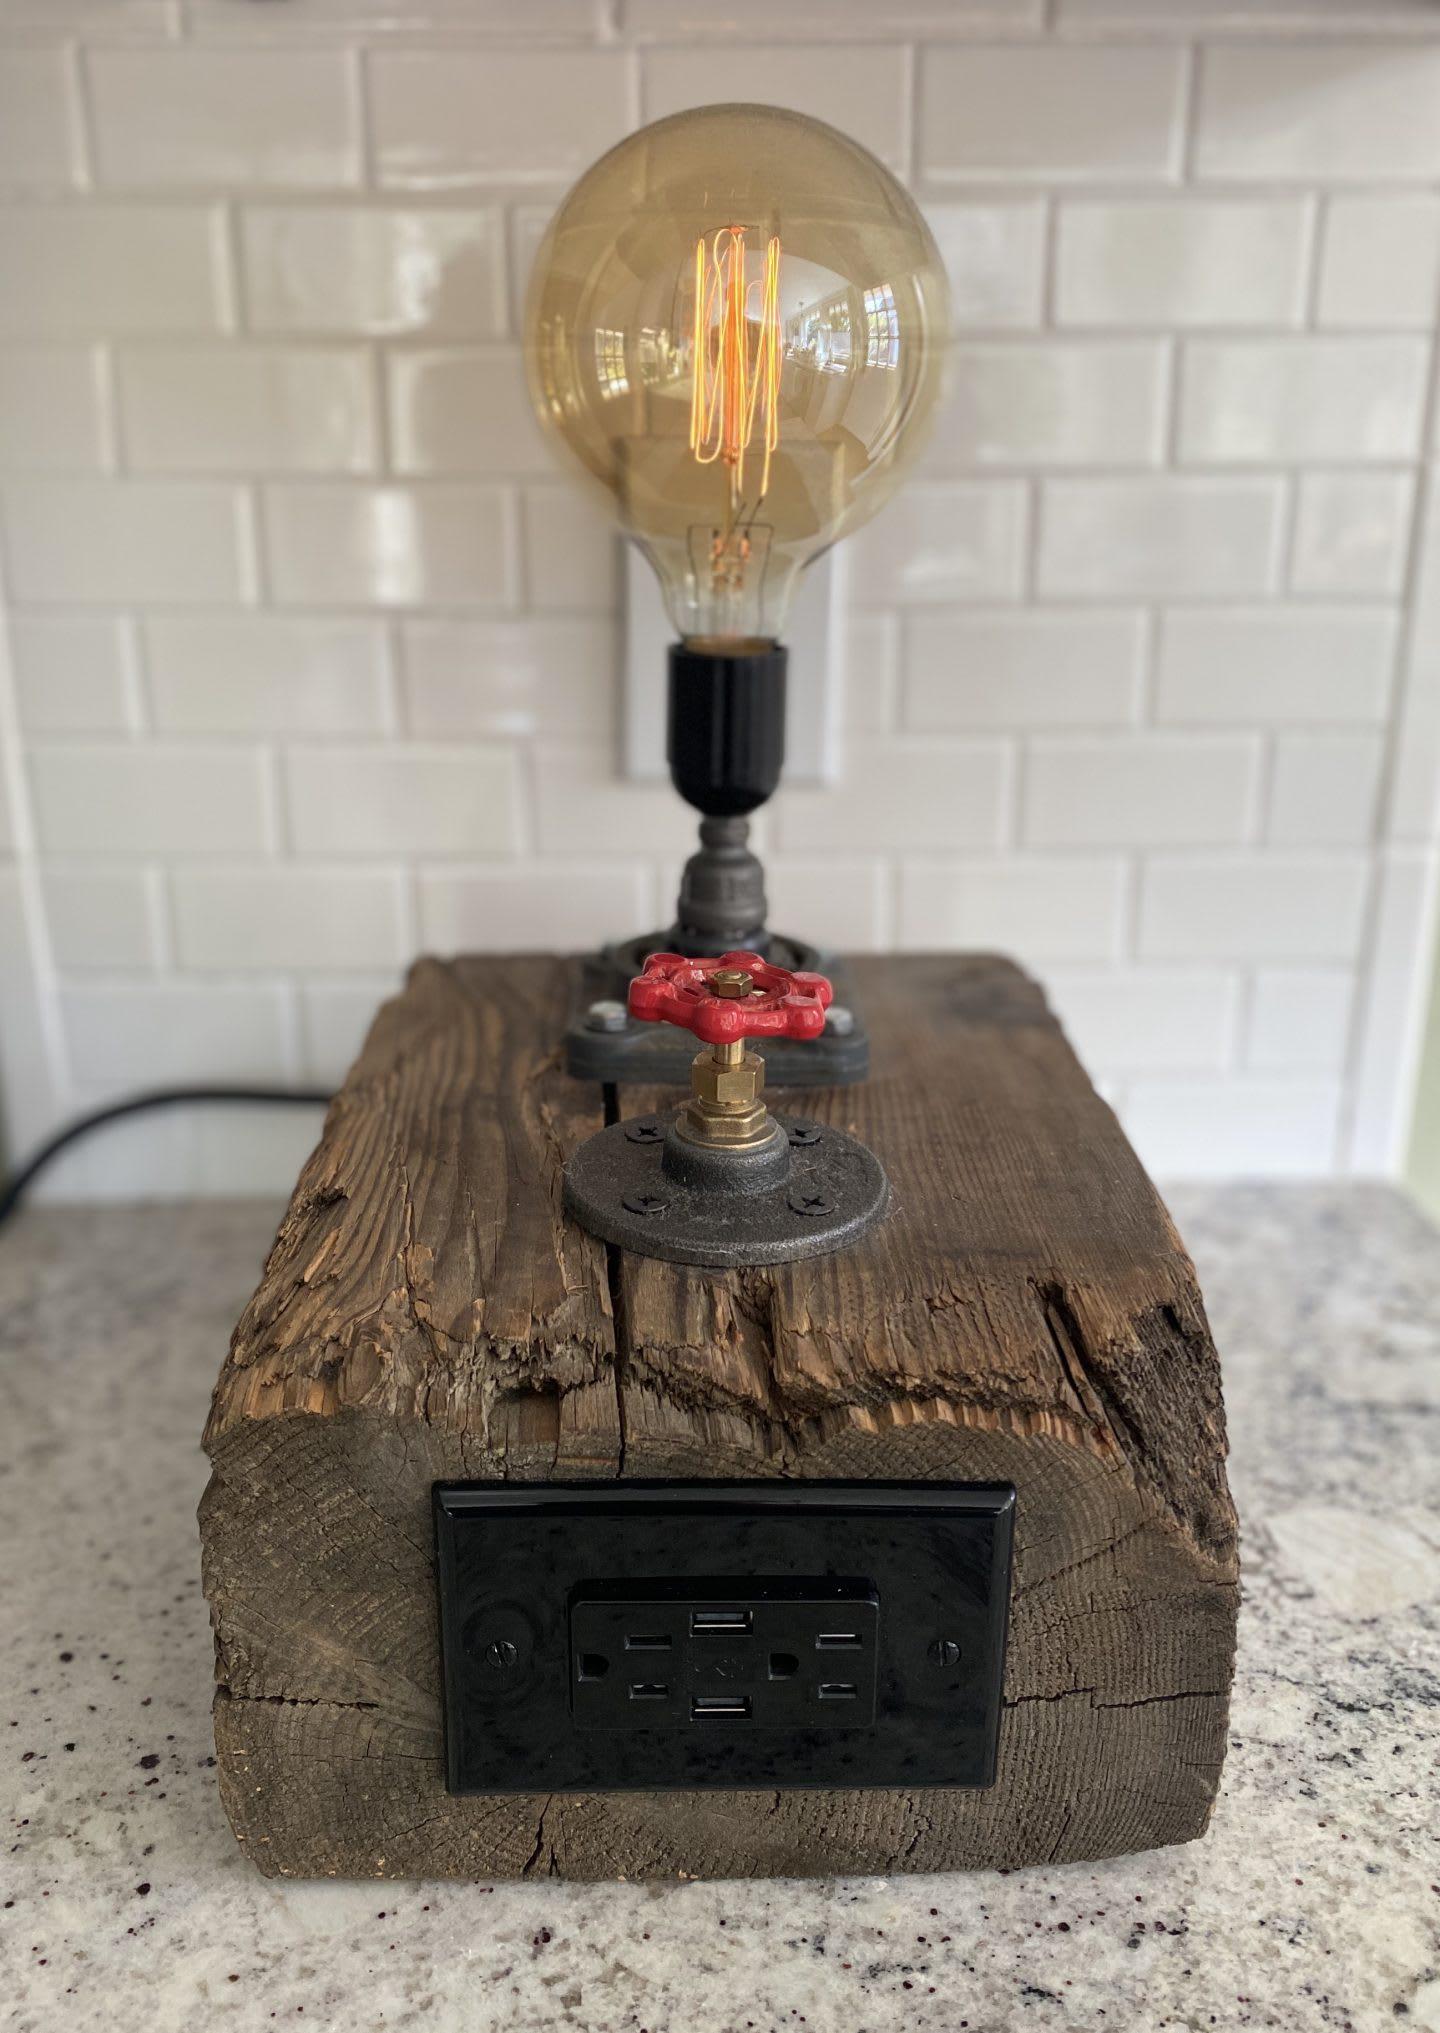 Handmade lamp construction made from old materials, light bulb, creation, customized, Ed Musho, adidas, employee